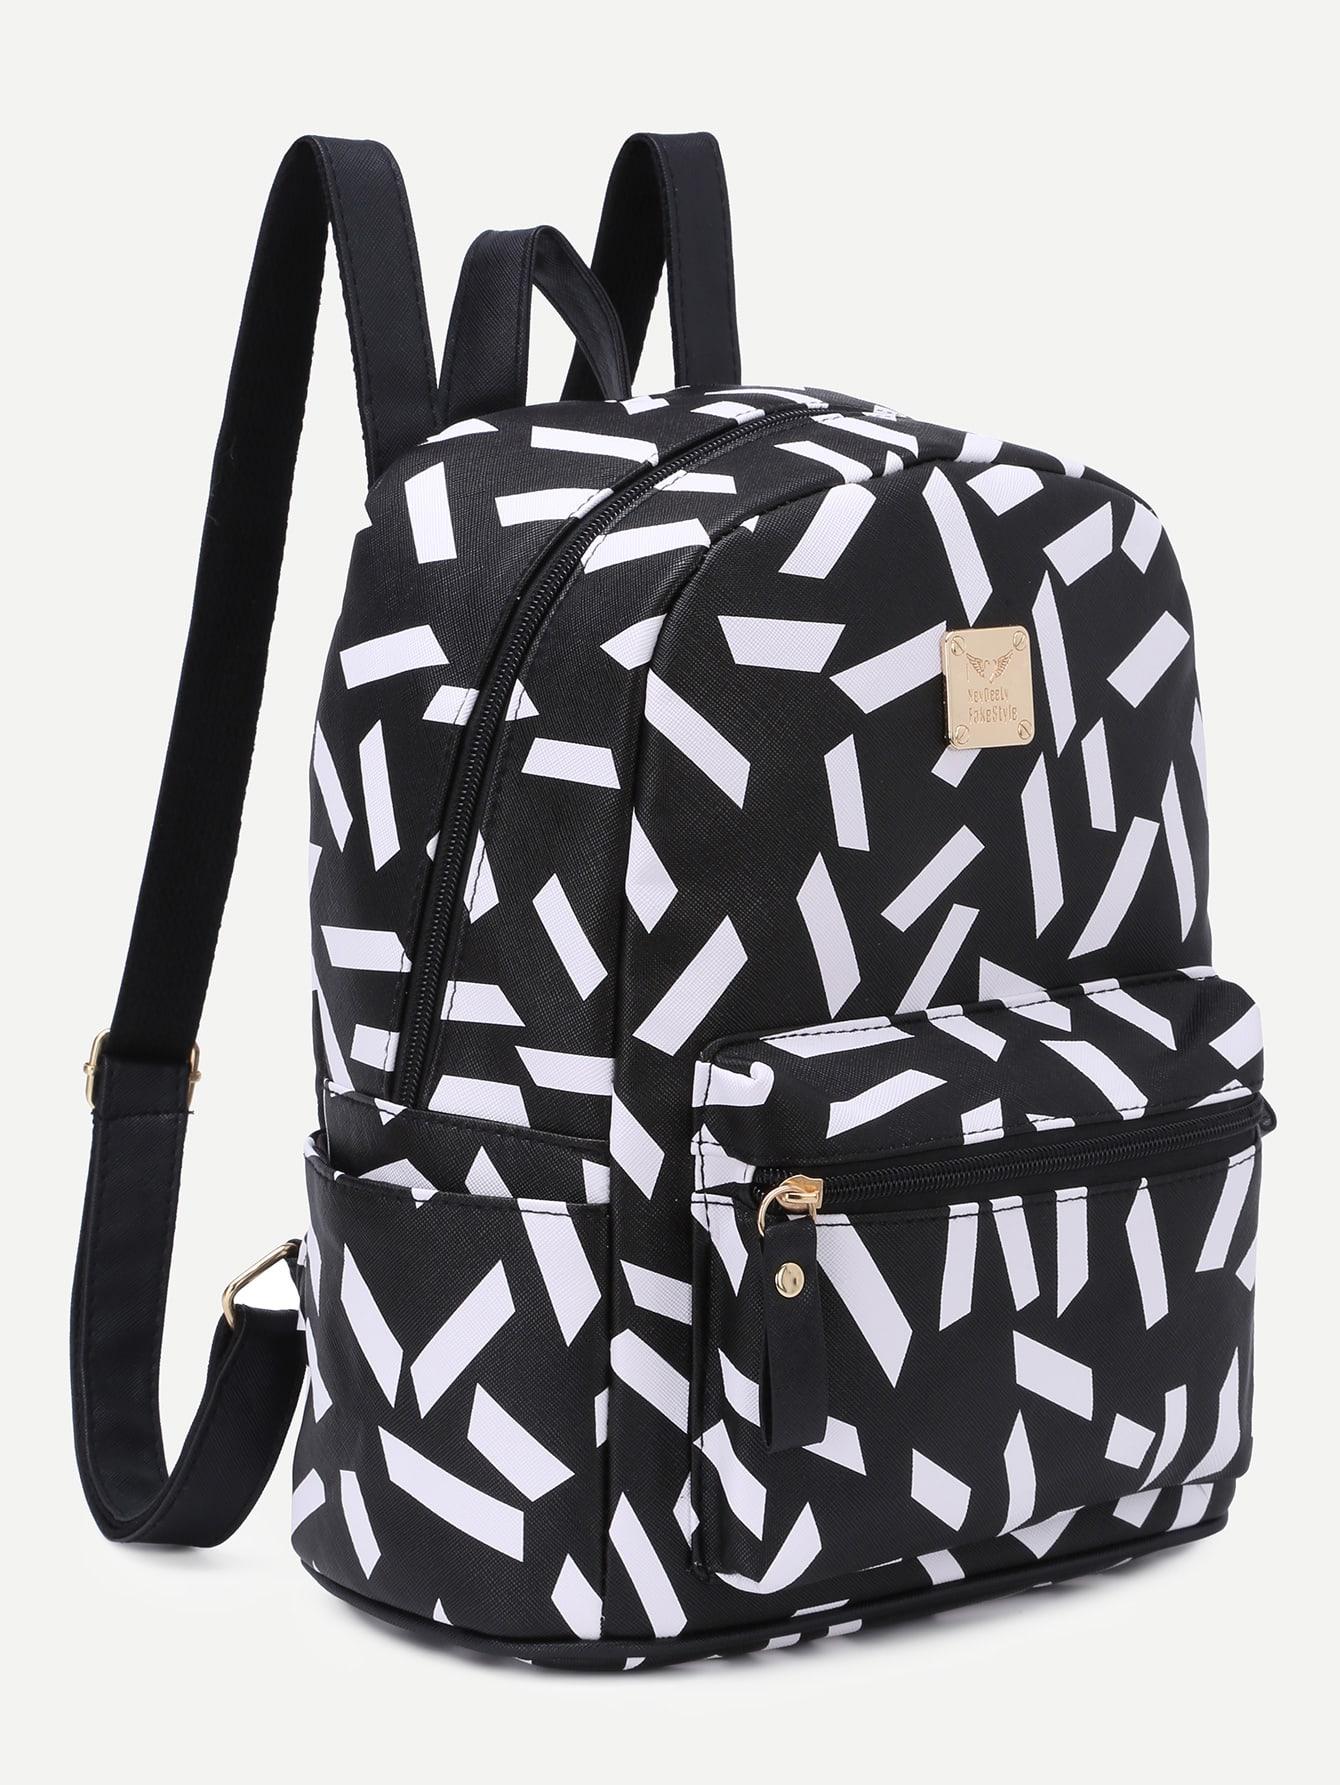 bag160818901_2